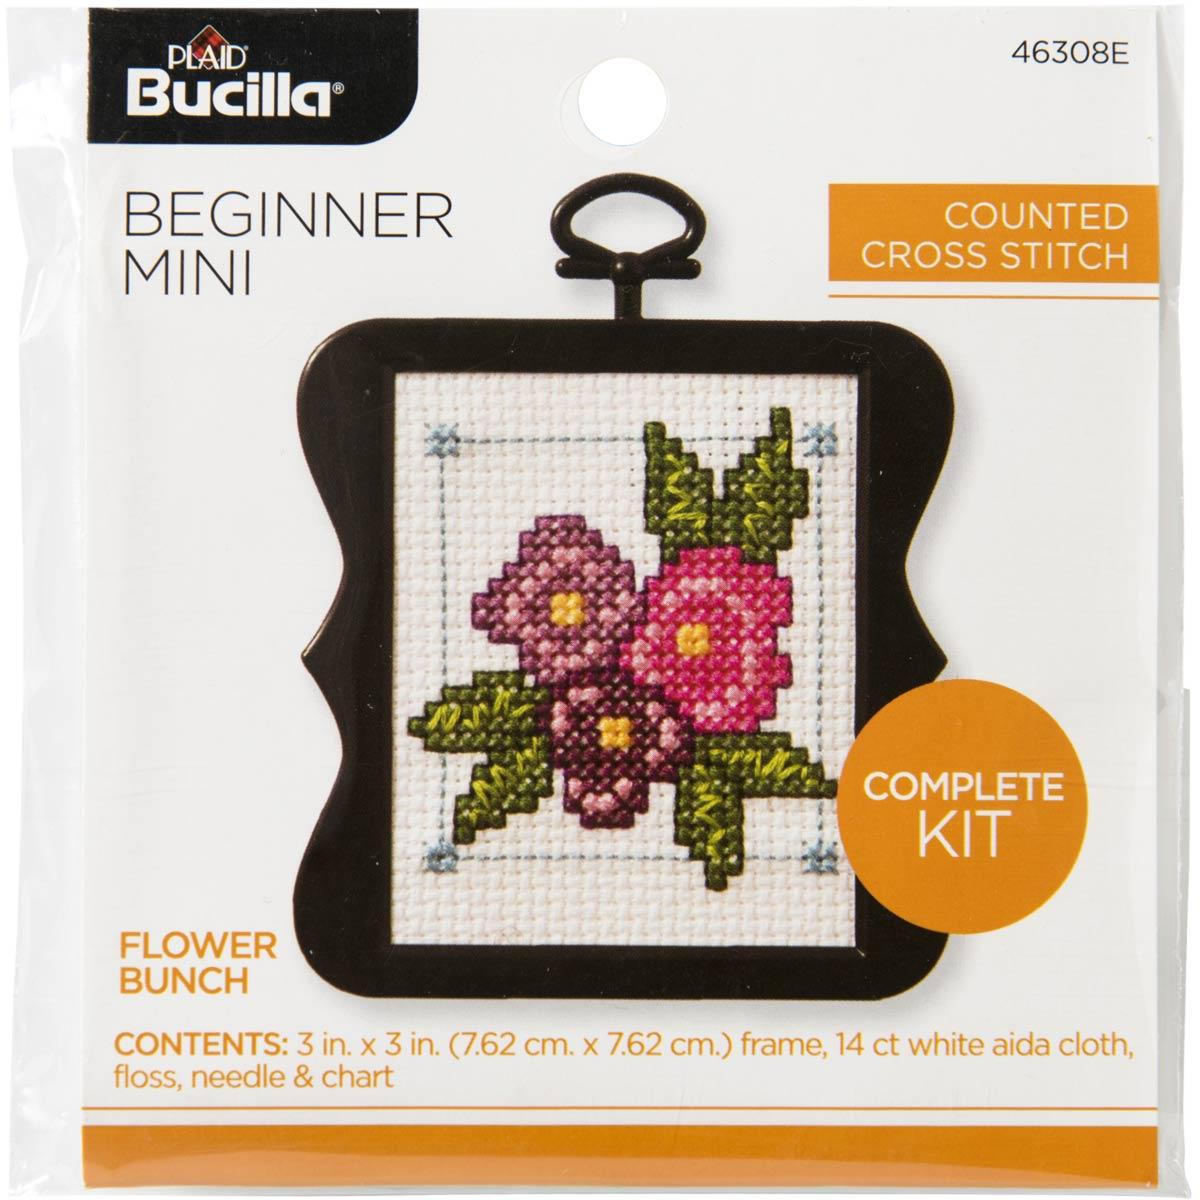 Bucilla ® Counted Cross Stitch - Beginner Stitchery - Mini - Flower Bunch - 46308E